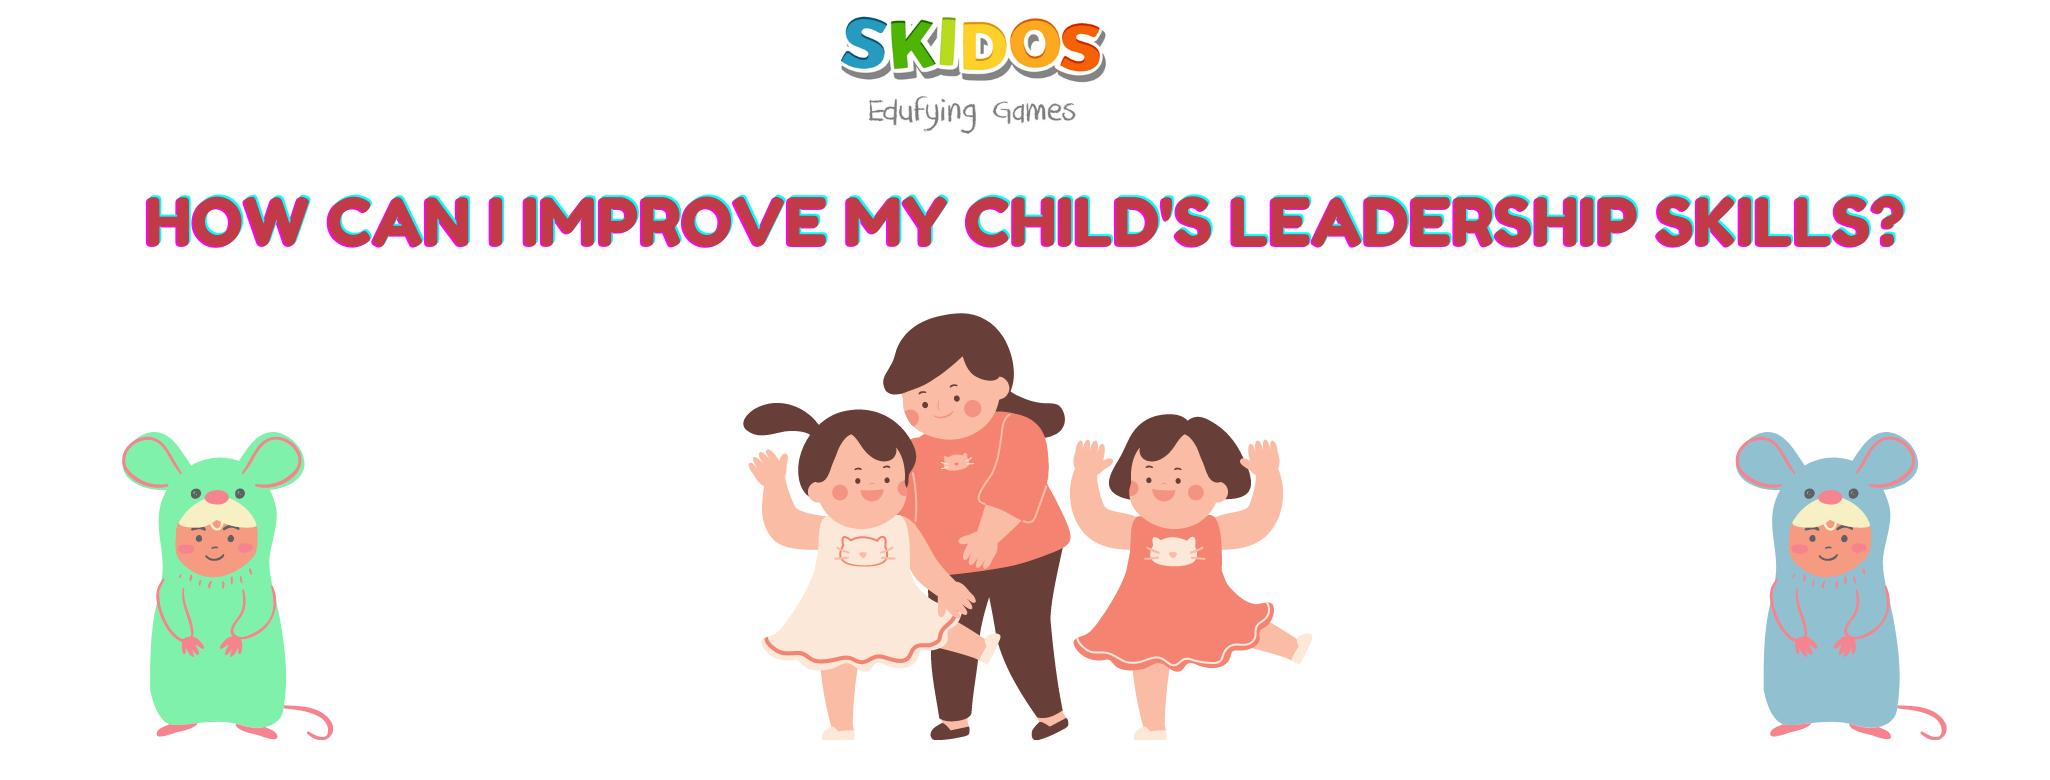 How can I improve my child's leadership skills